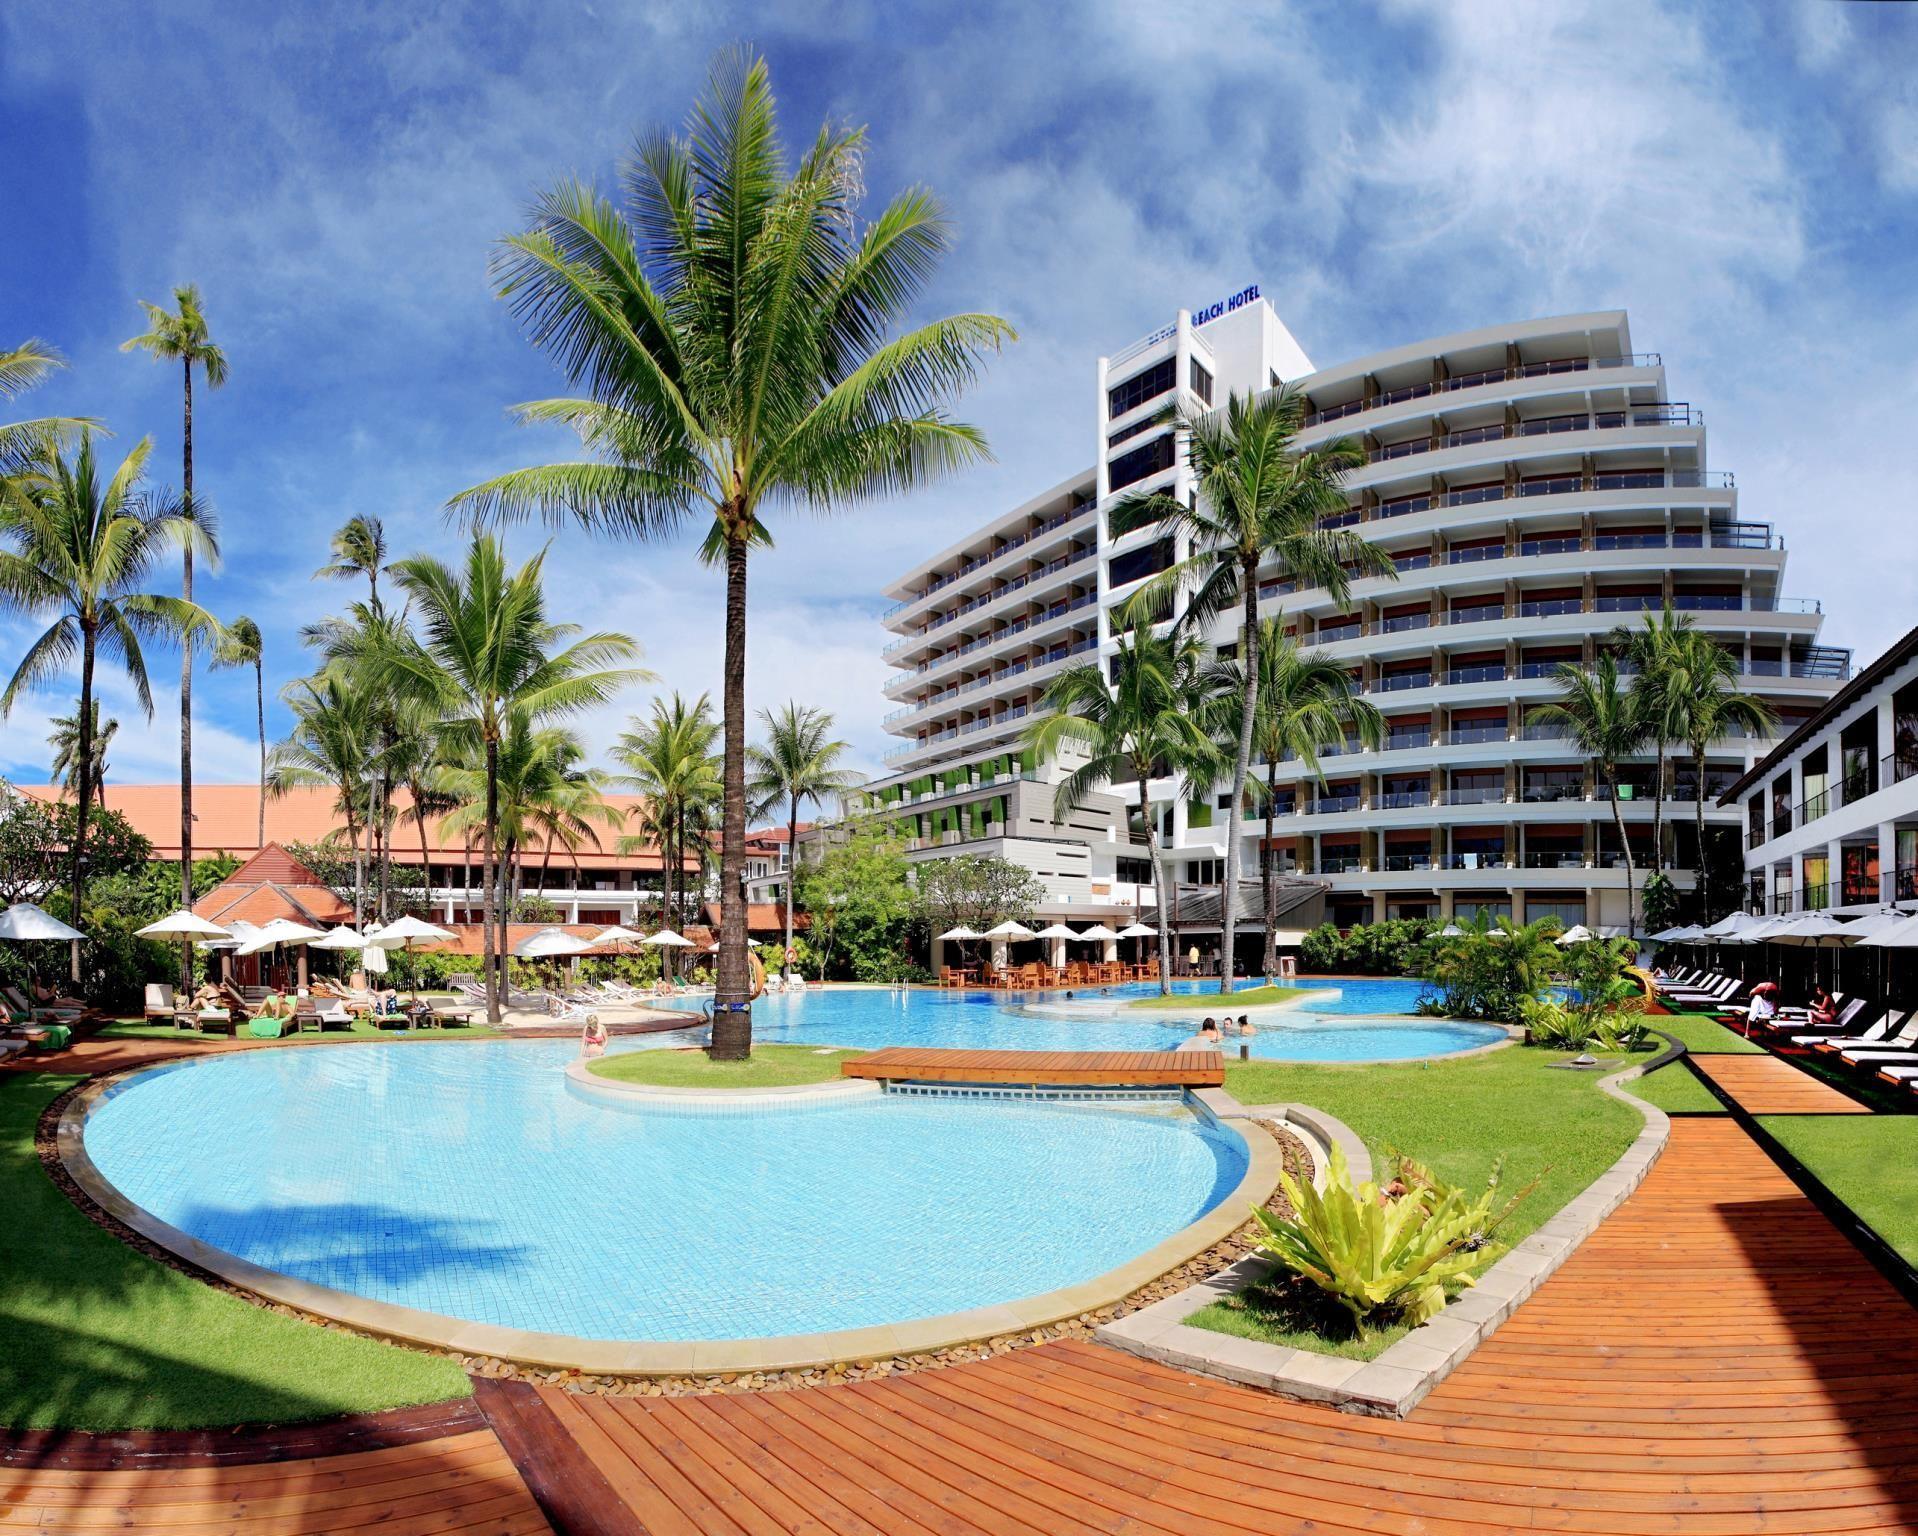 Phuket Patong Beach Hotel Thailand Asia Ideally